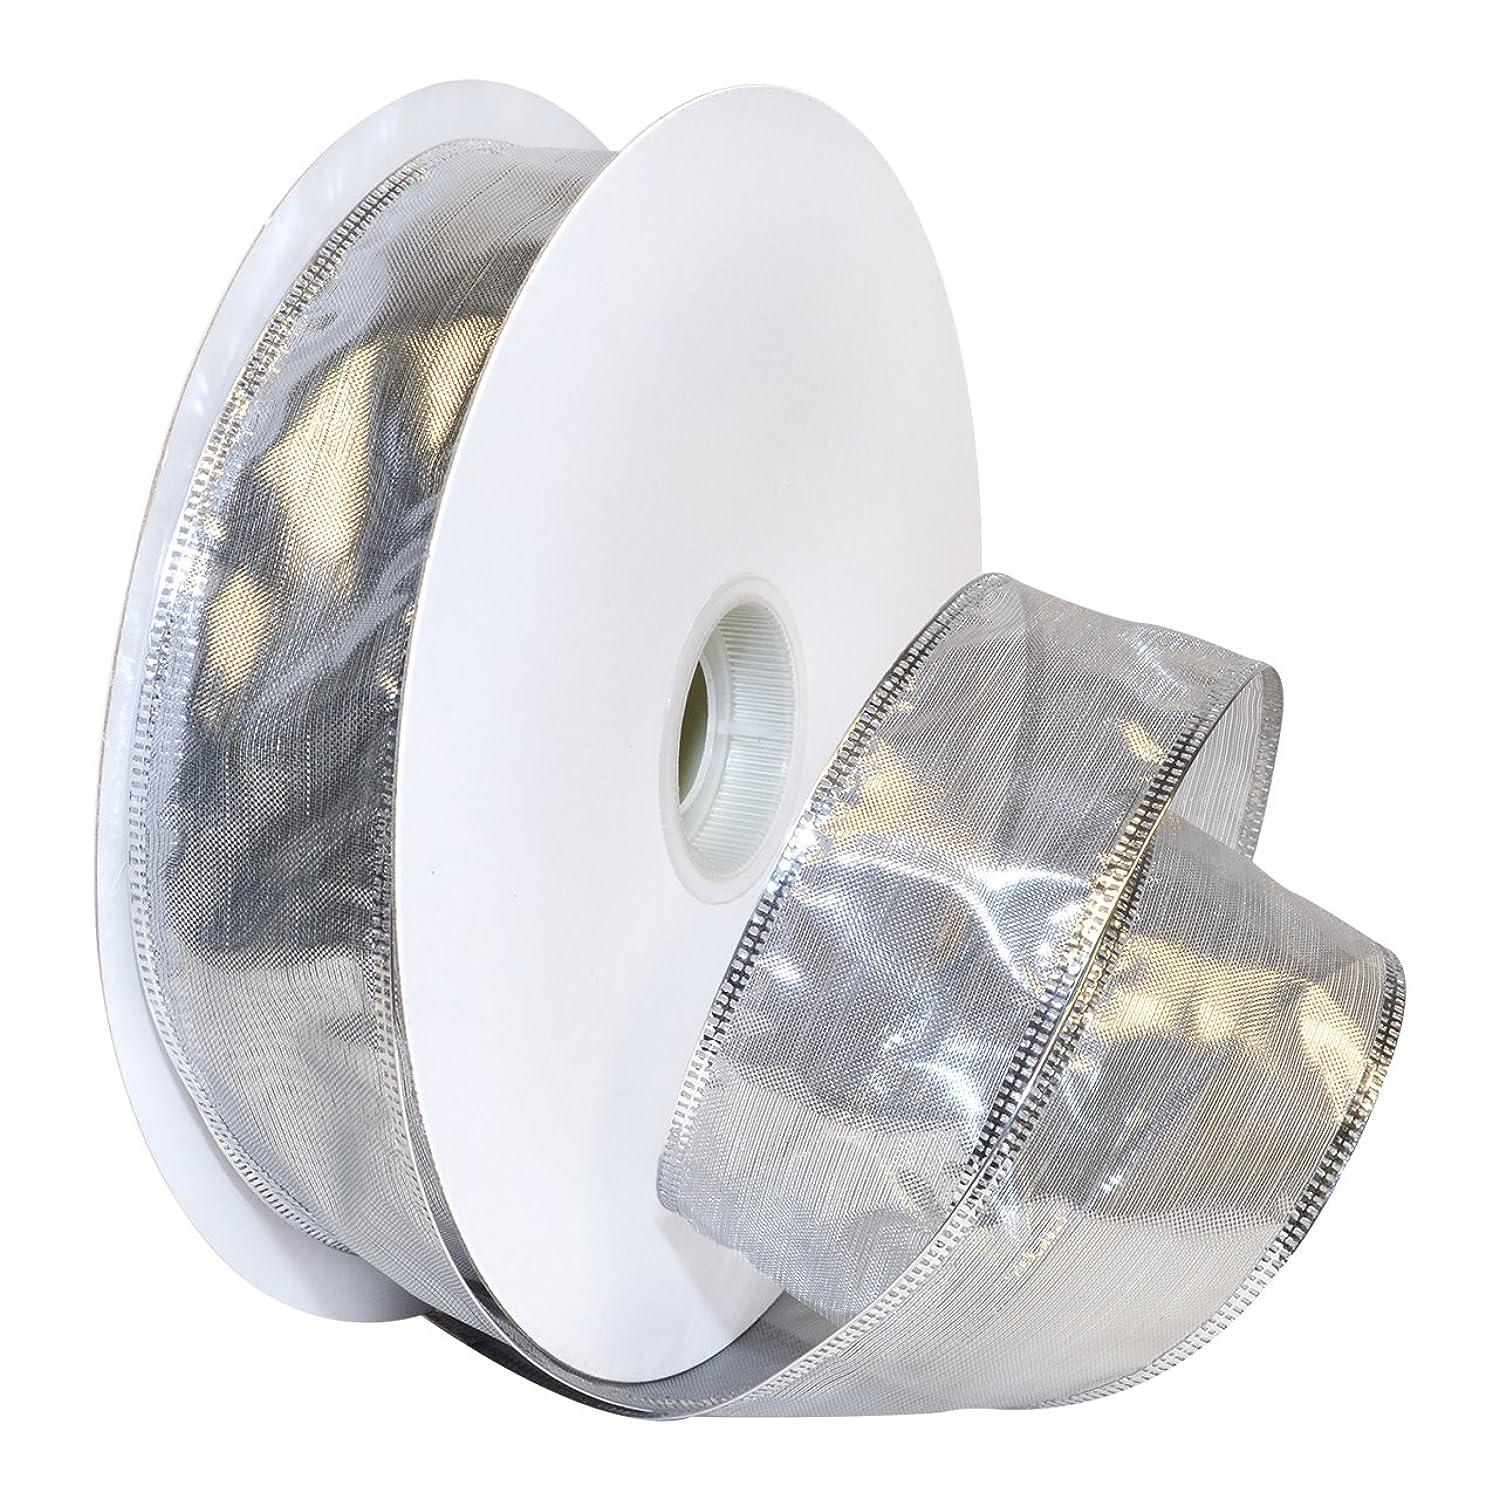 Morex Ribbon Gleam Wired Metallic Sheer Ribbon, 1.5-in x 50-Yd, Silver